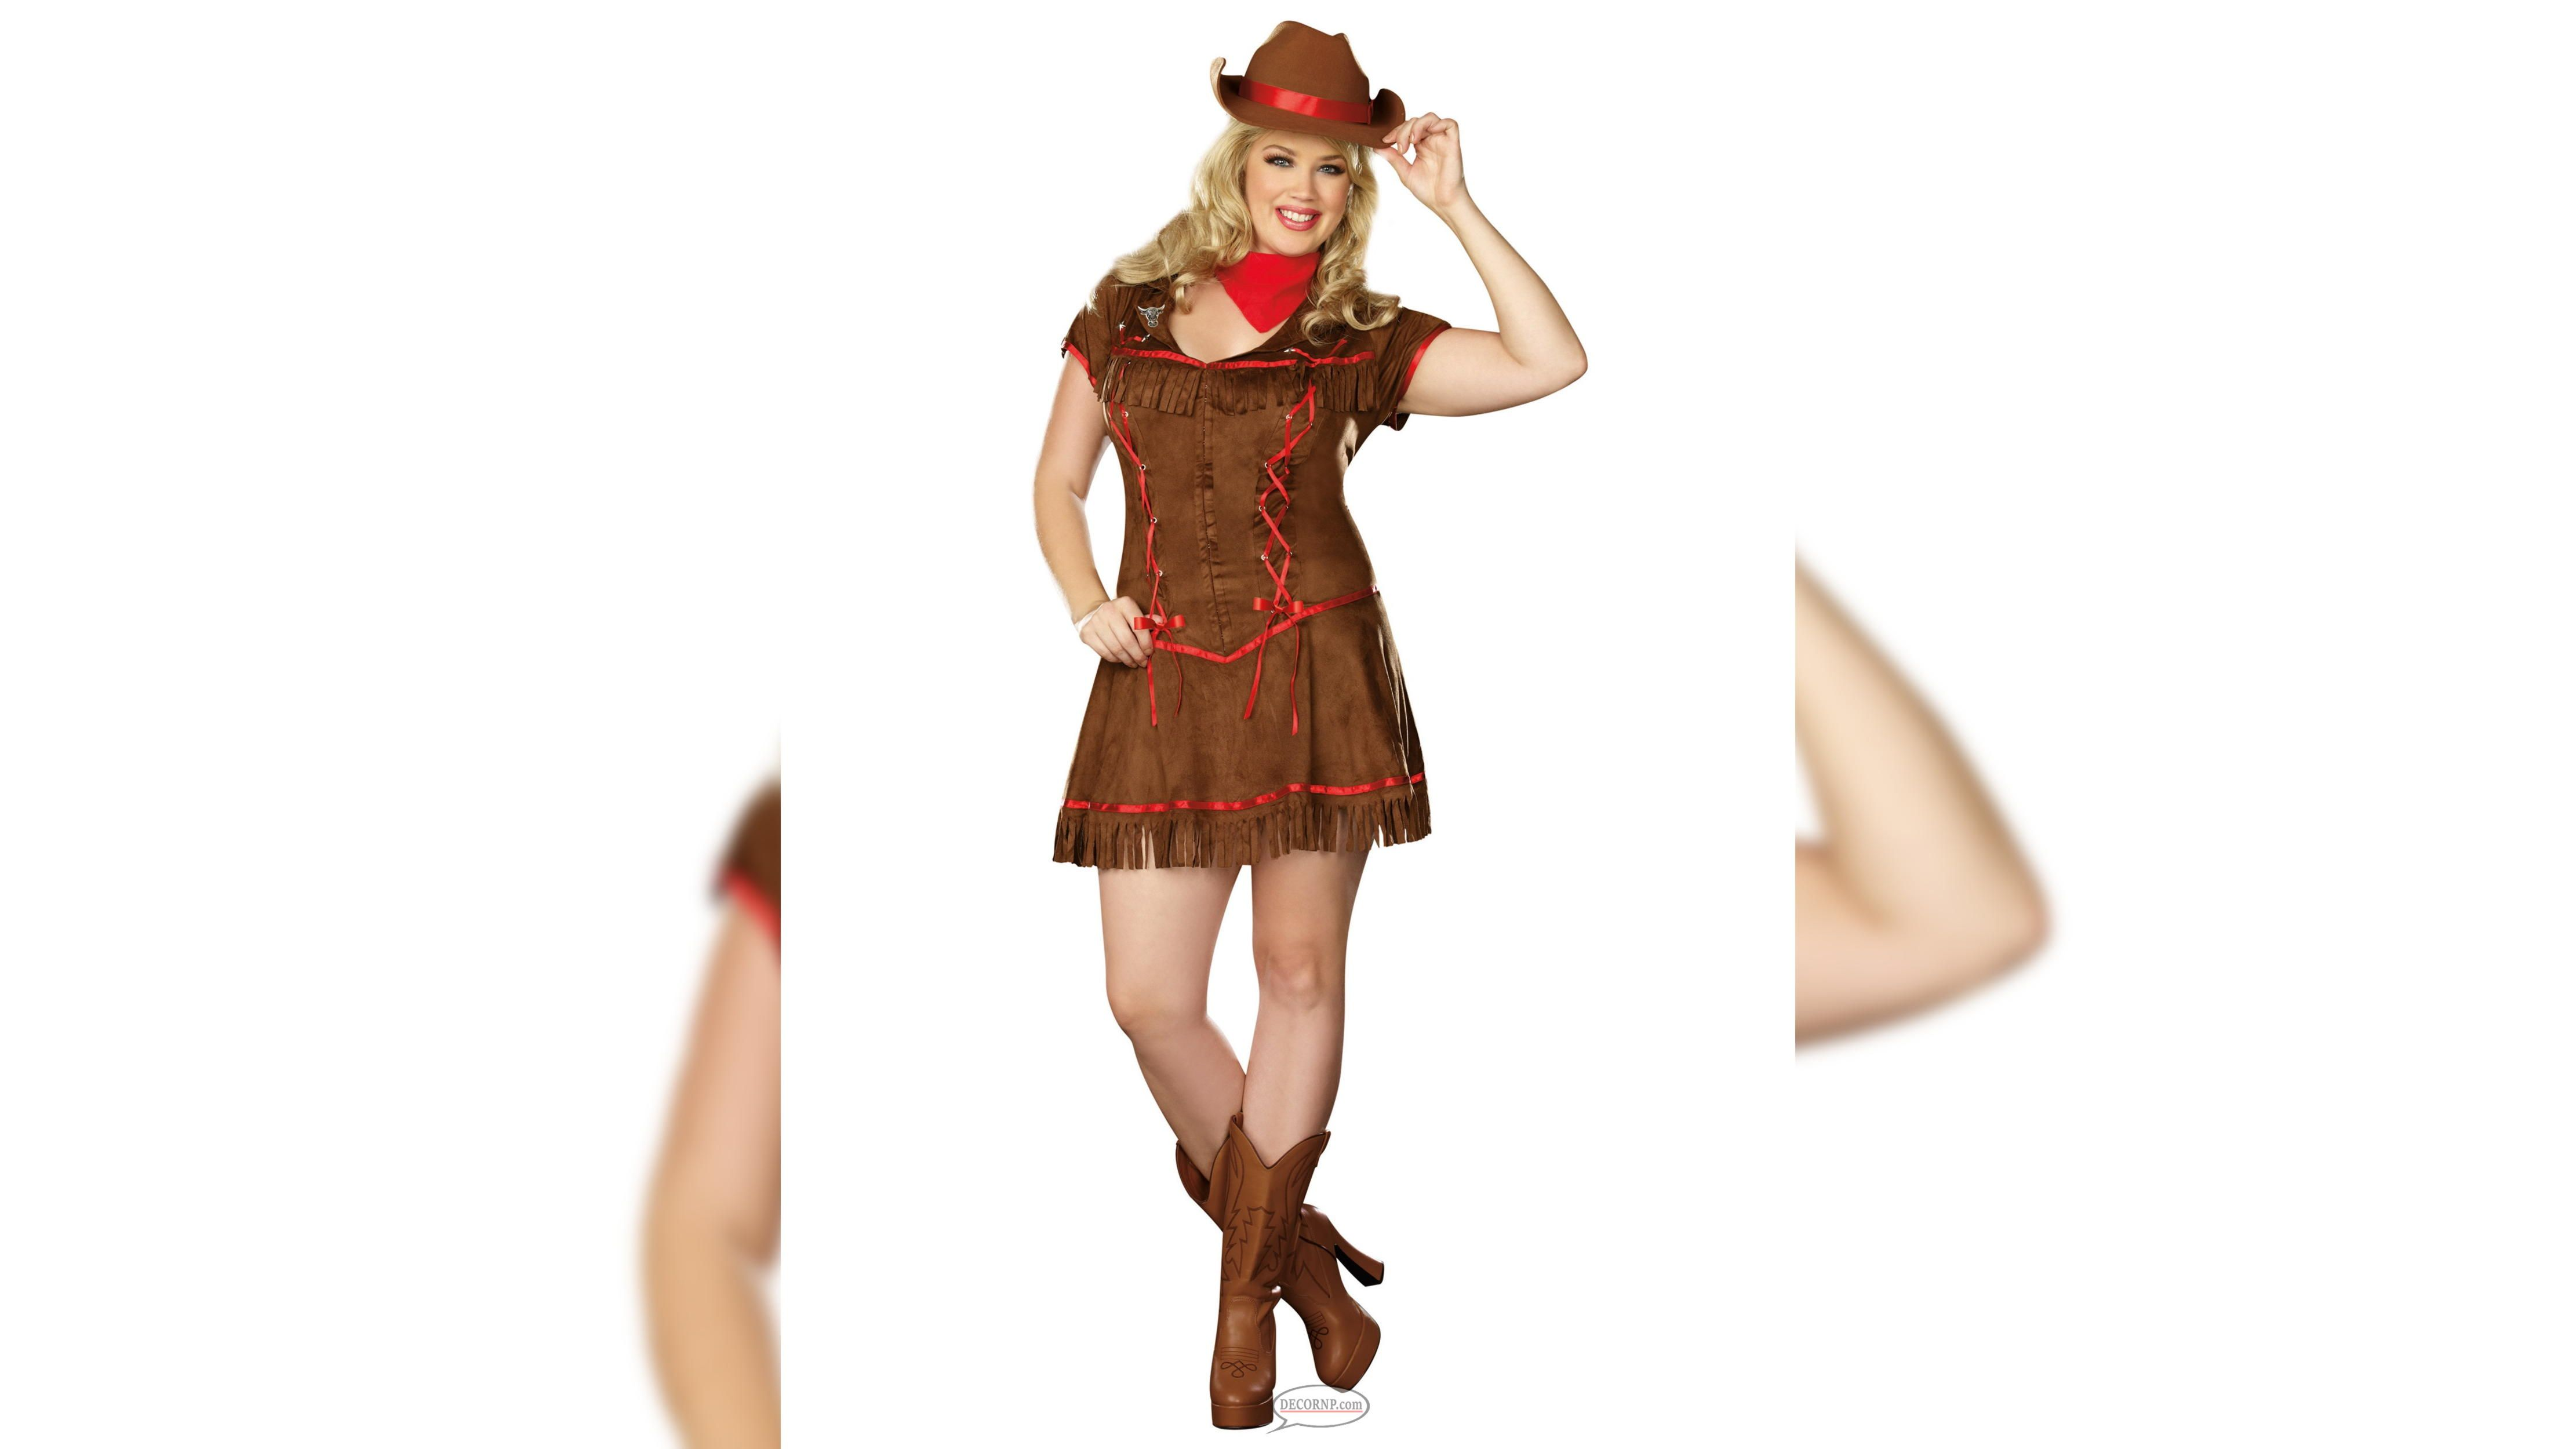 adult halloween costumes new 2018 | other's | pinterest | halloween